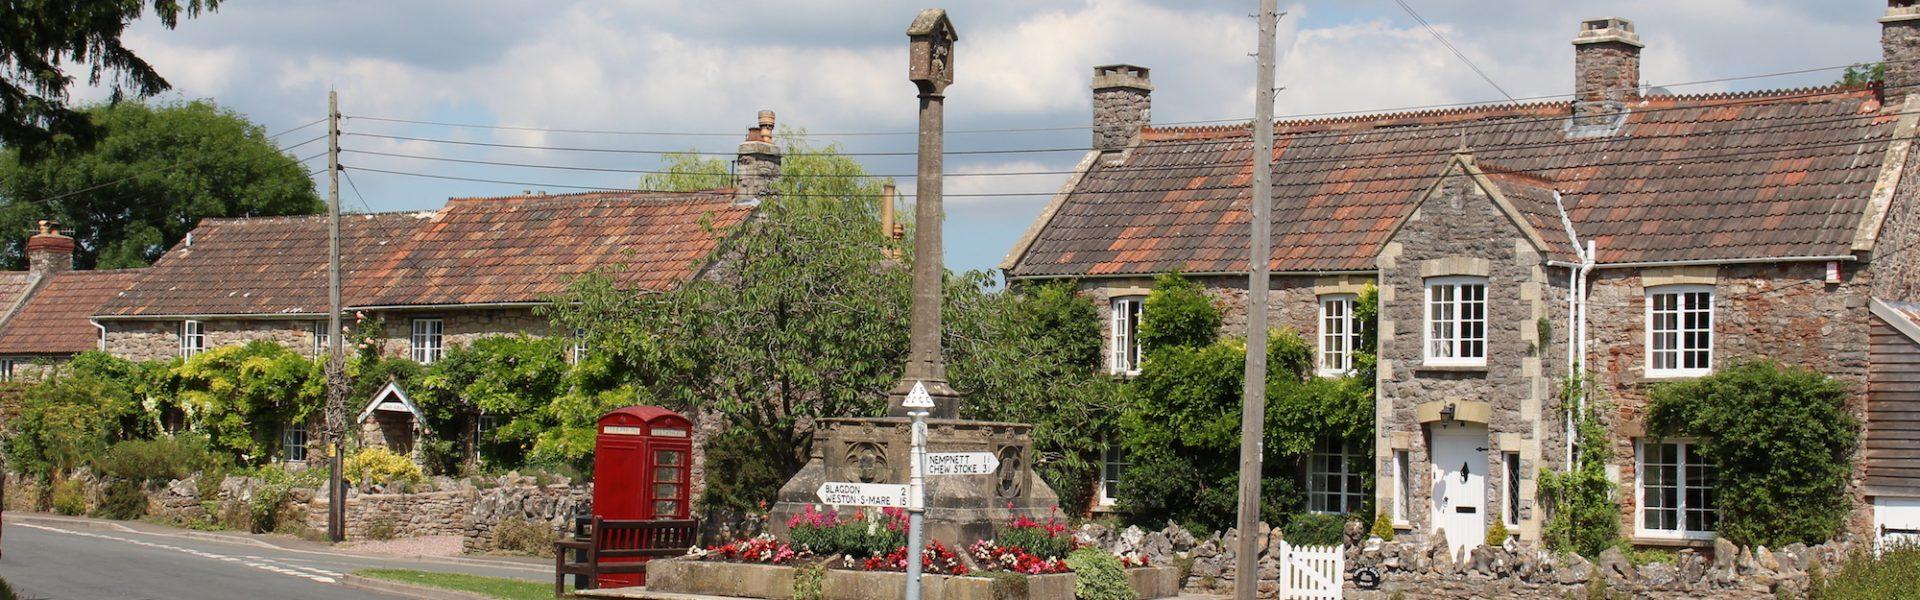 Ubley Village